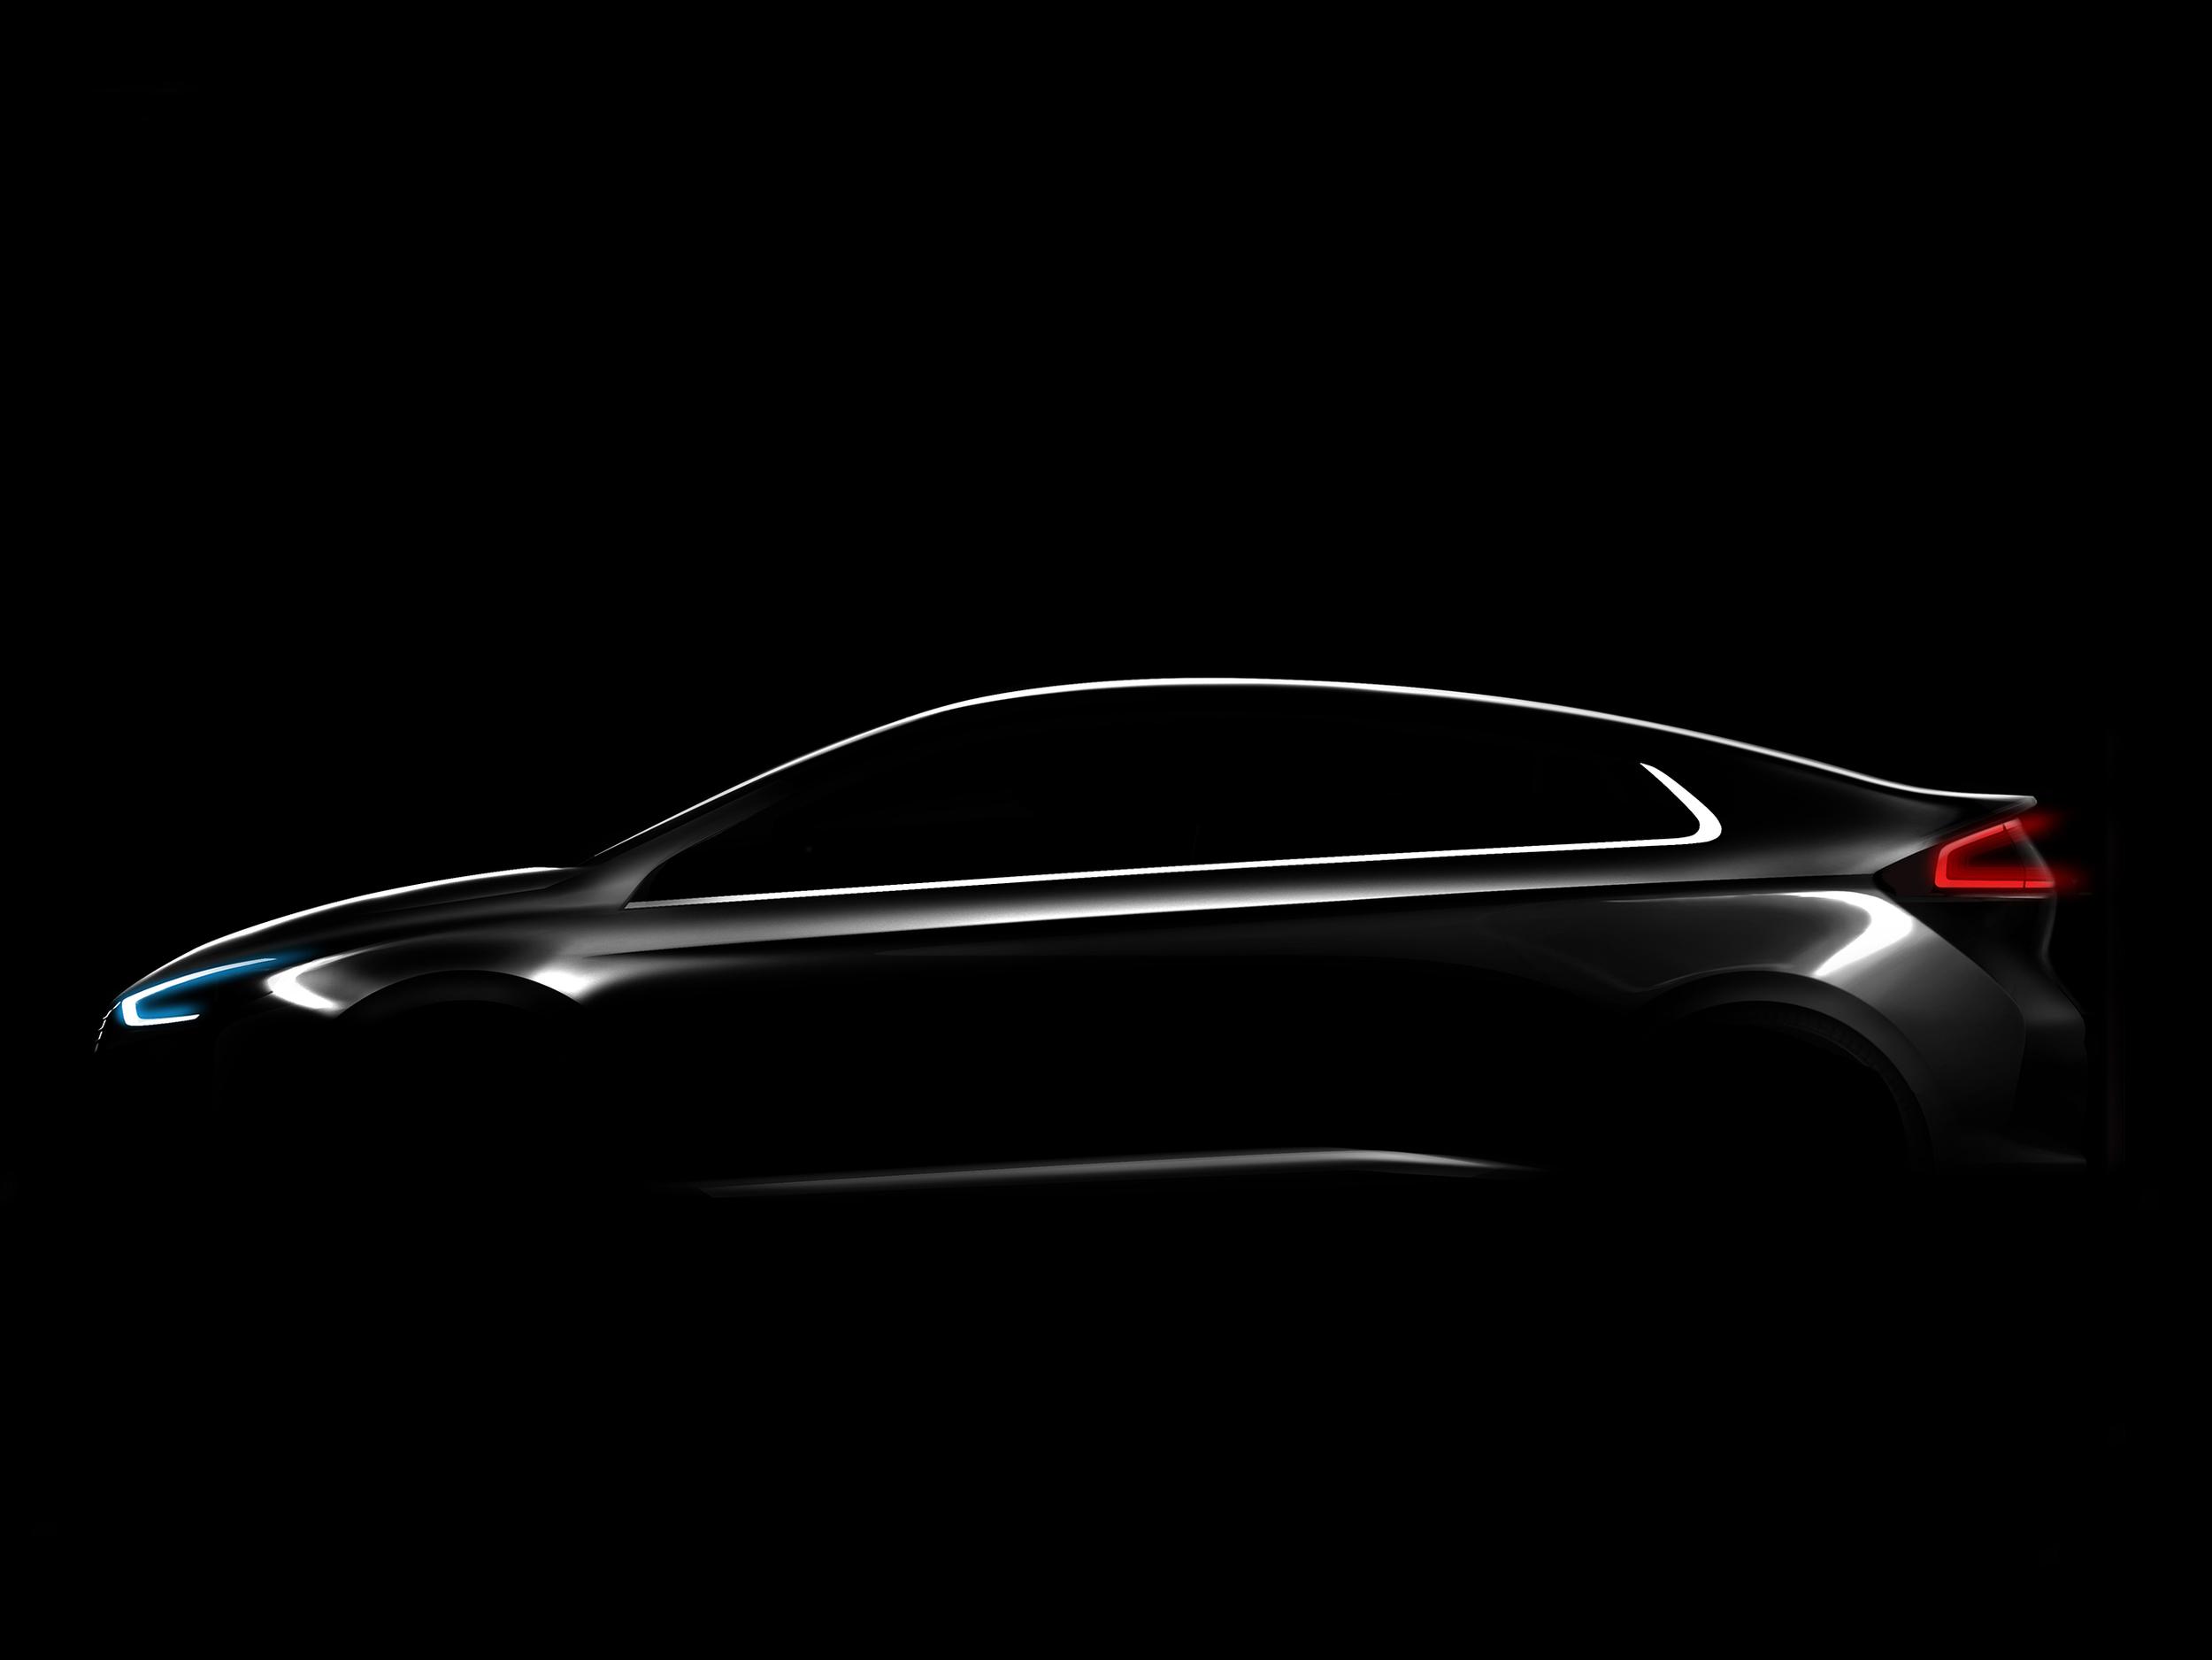 Hyundai confirms new IONIQ eco-car